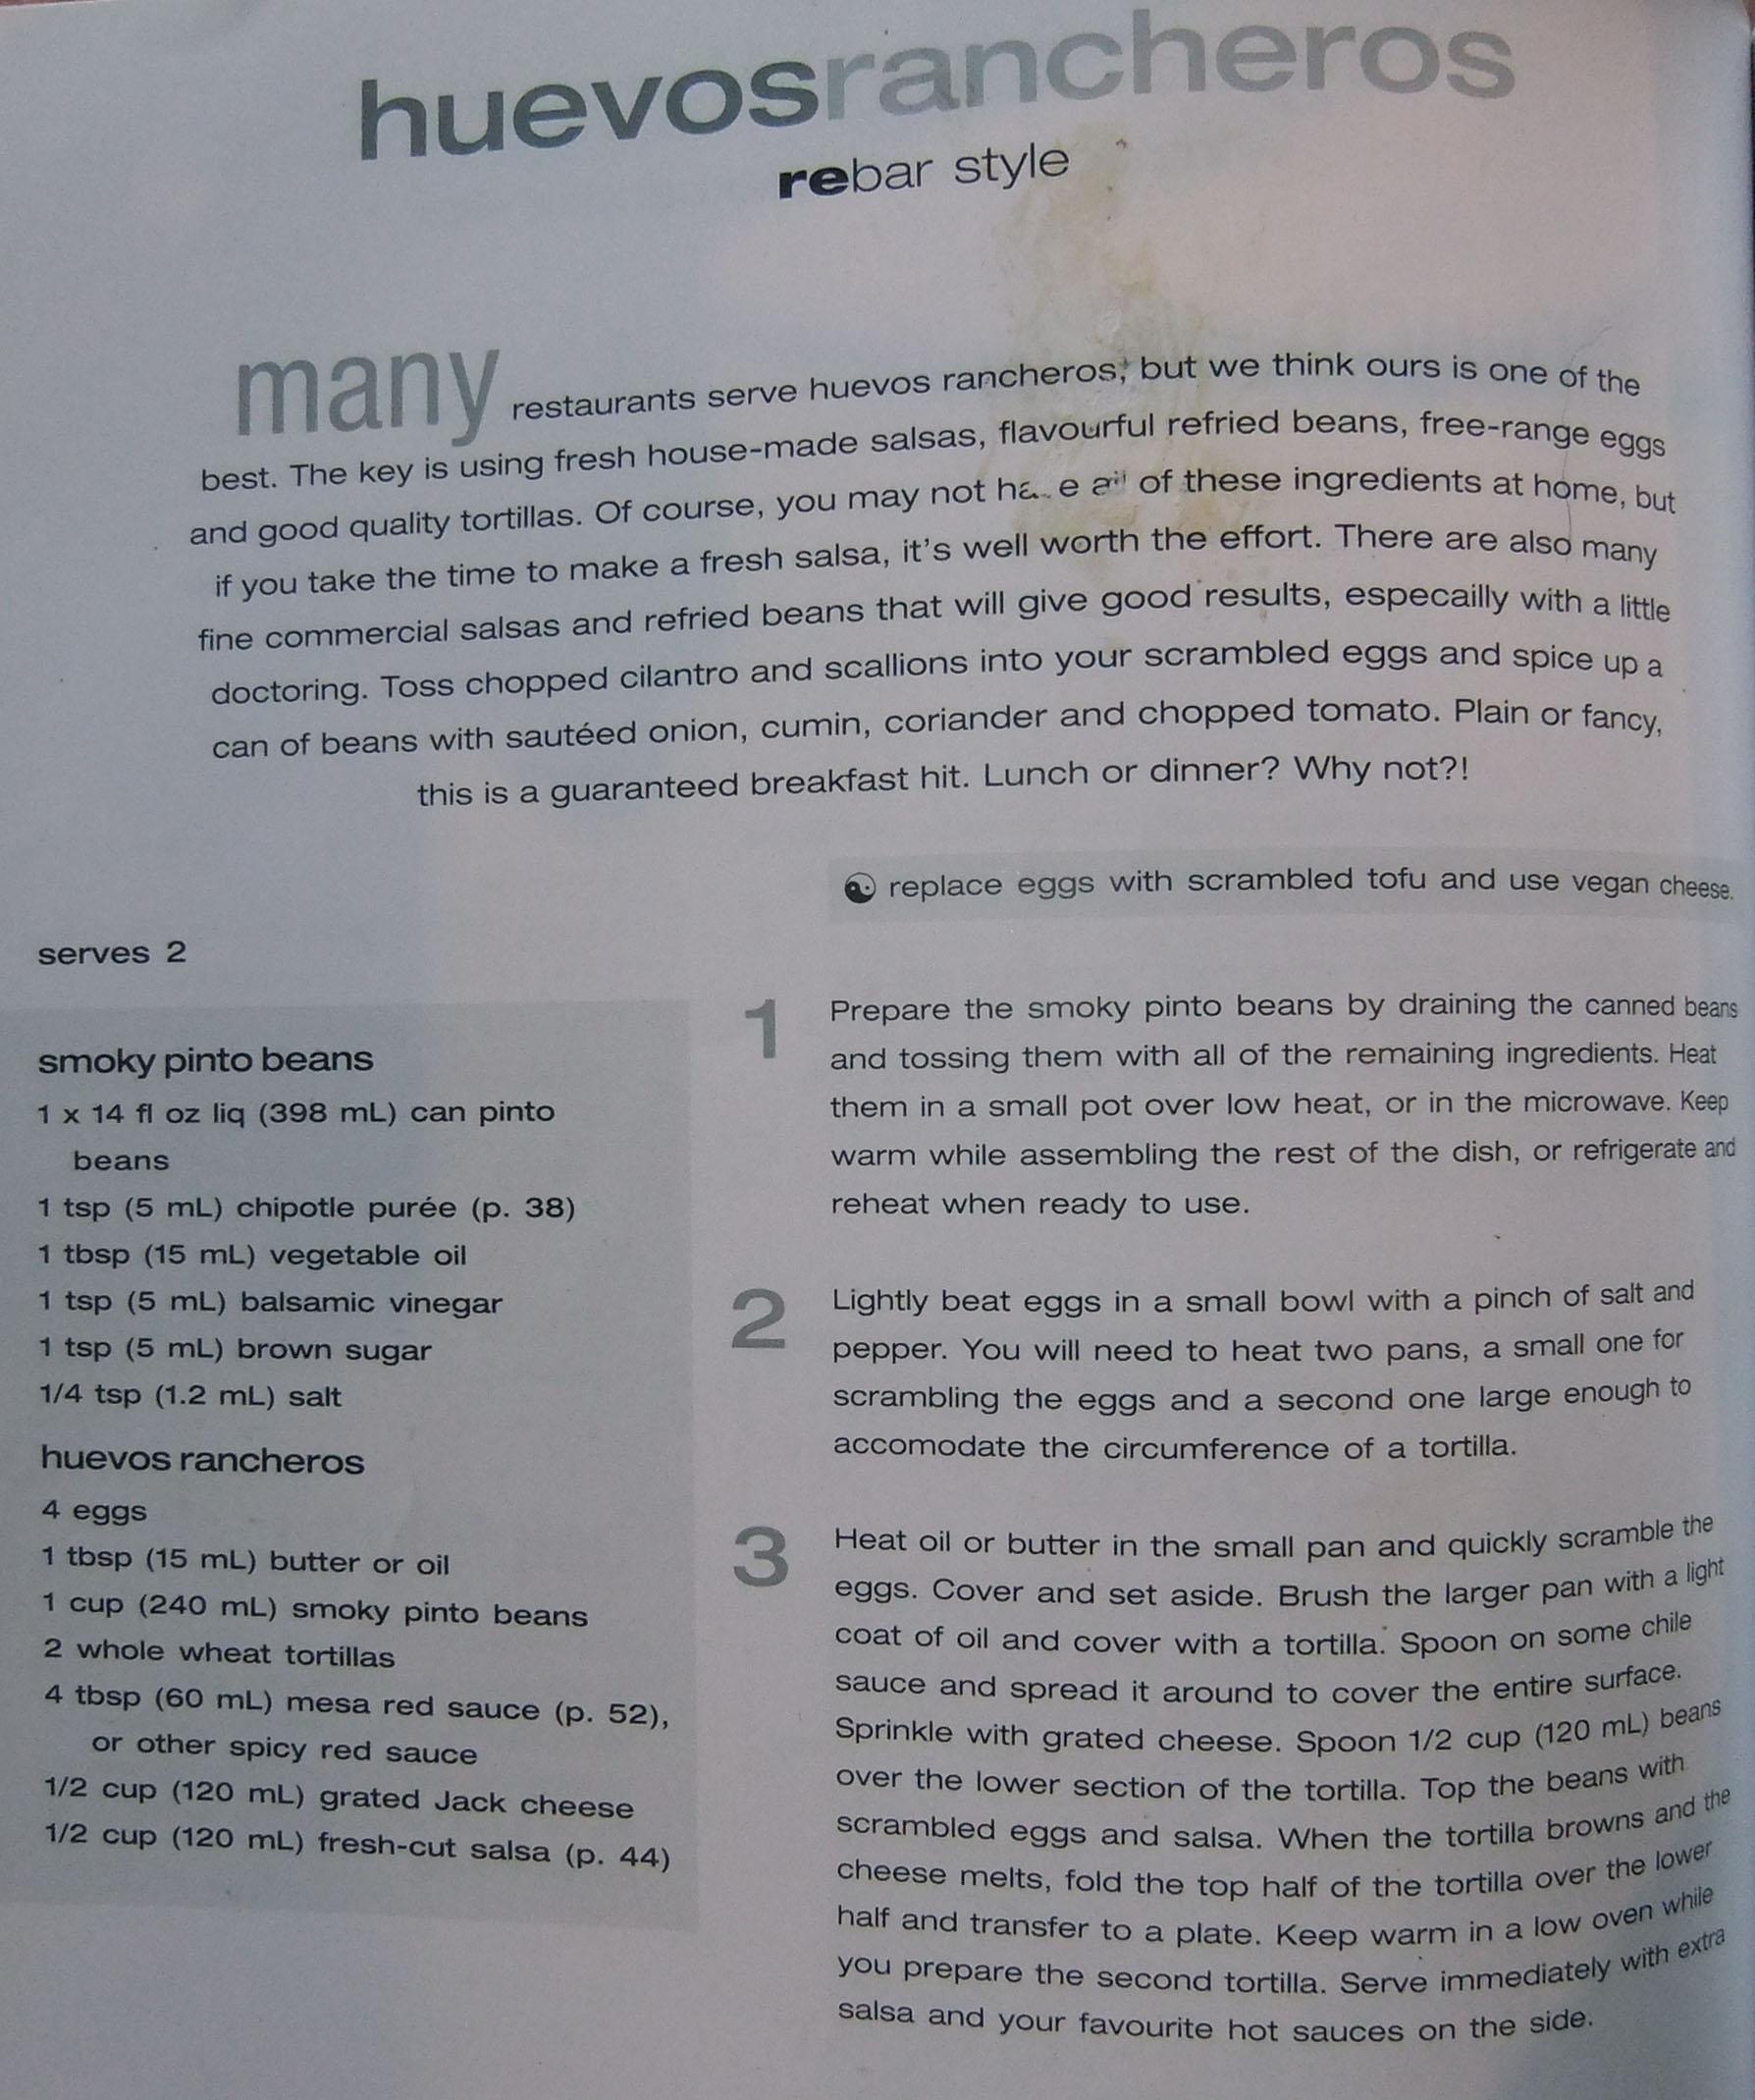 Index of recipes 11 jan 2018 2044 177k jambalayapdf 11 jan 2018 2044 119k kale cabbage slawtxt 28 sep 2016 0851 180 kale salad with fenn forumfinder Image collections